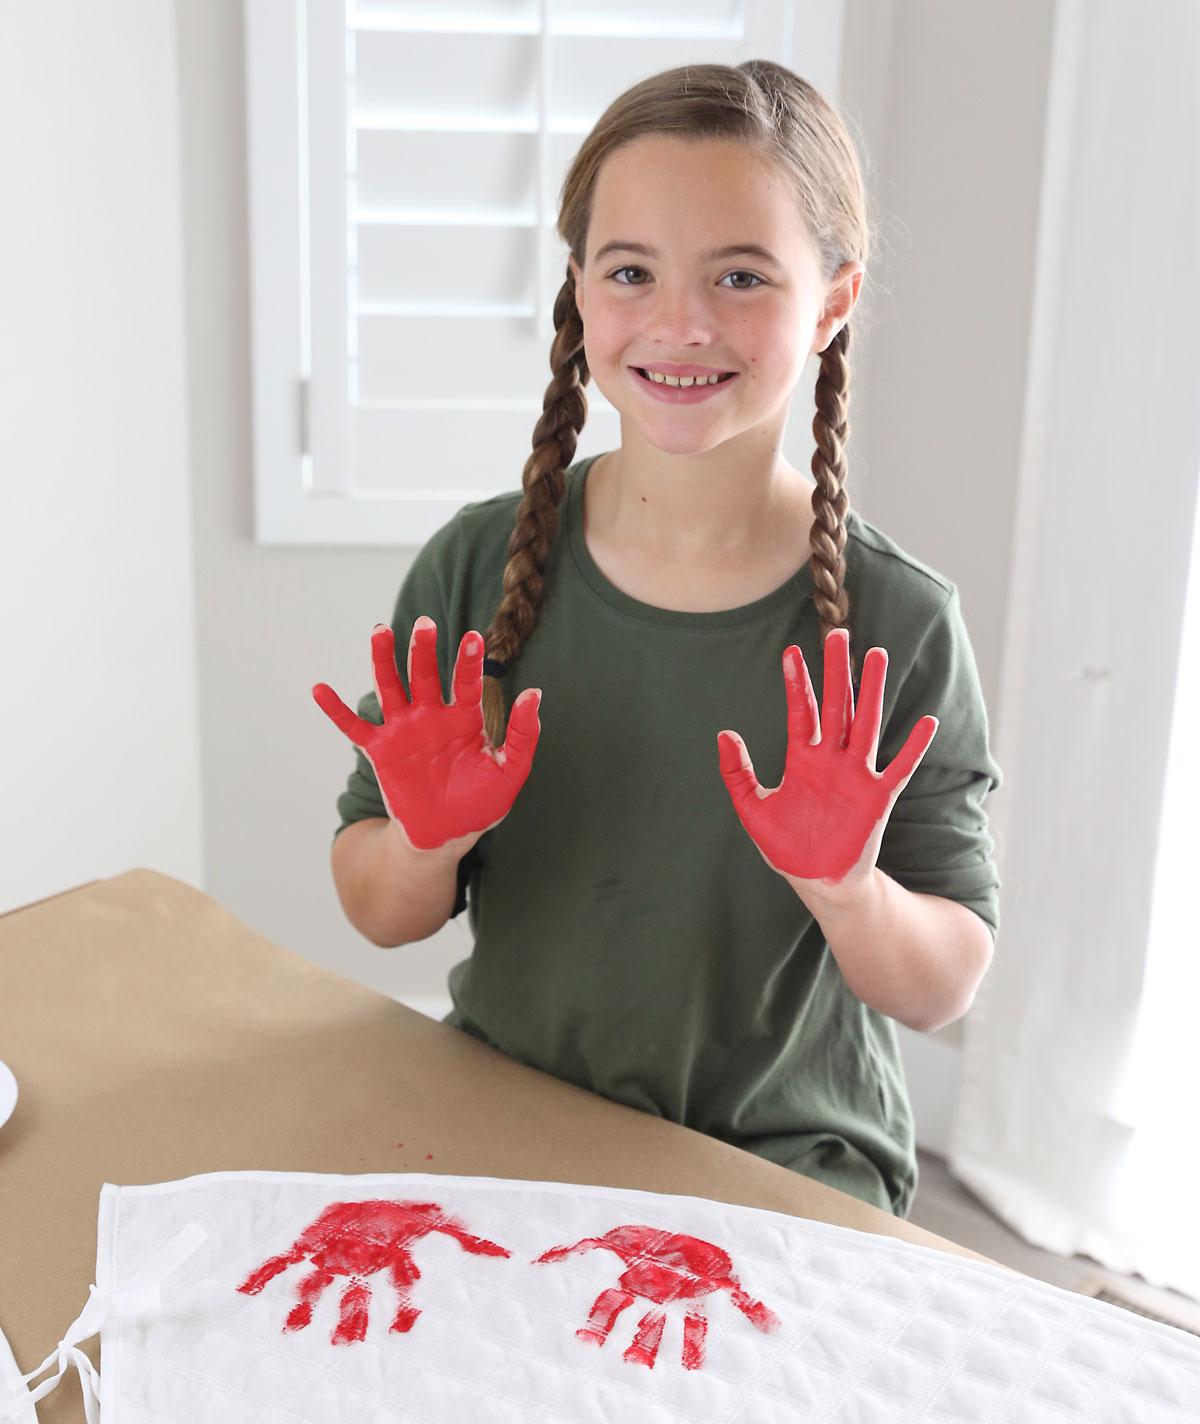 Girl making handprints on a Christmas tree skirt